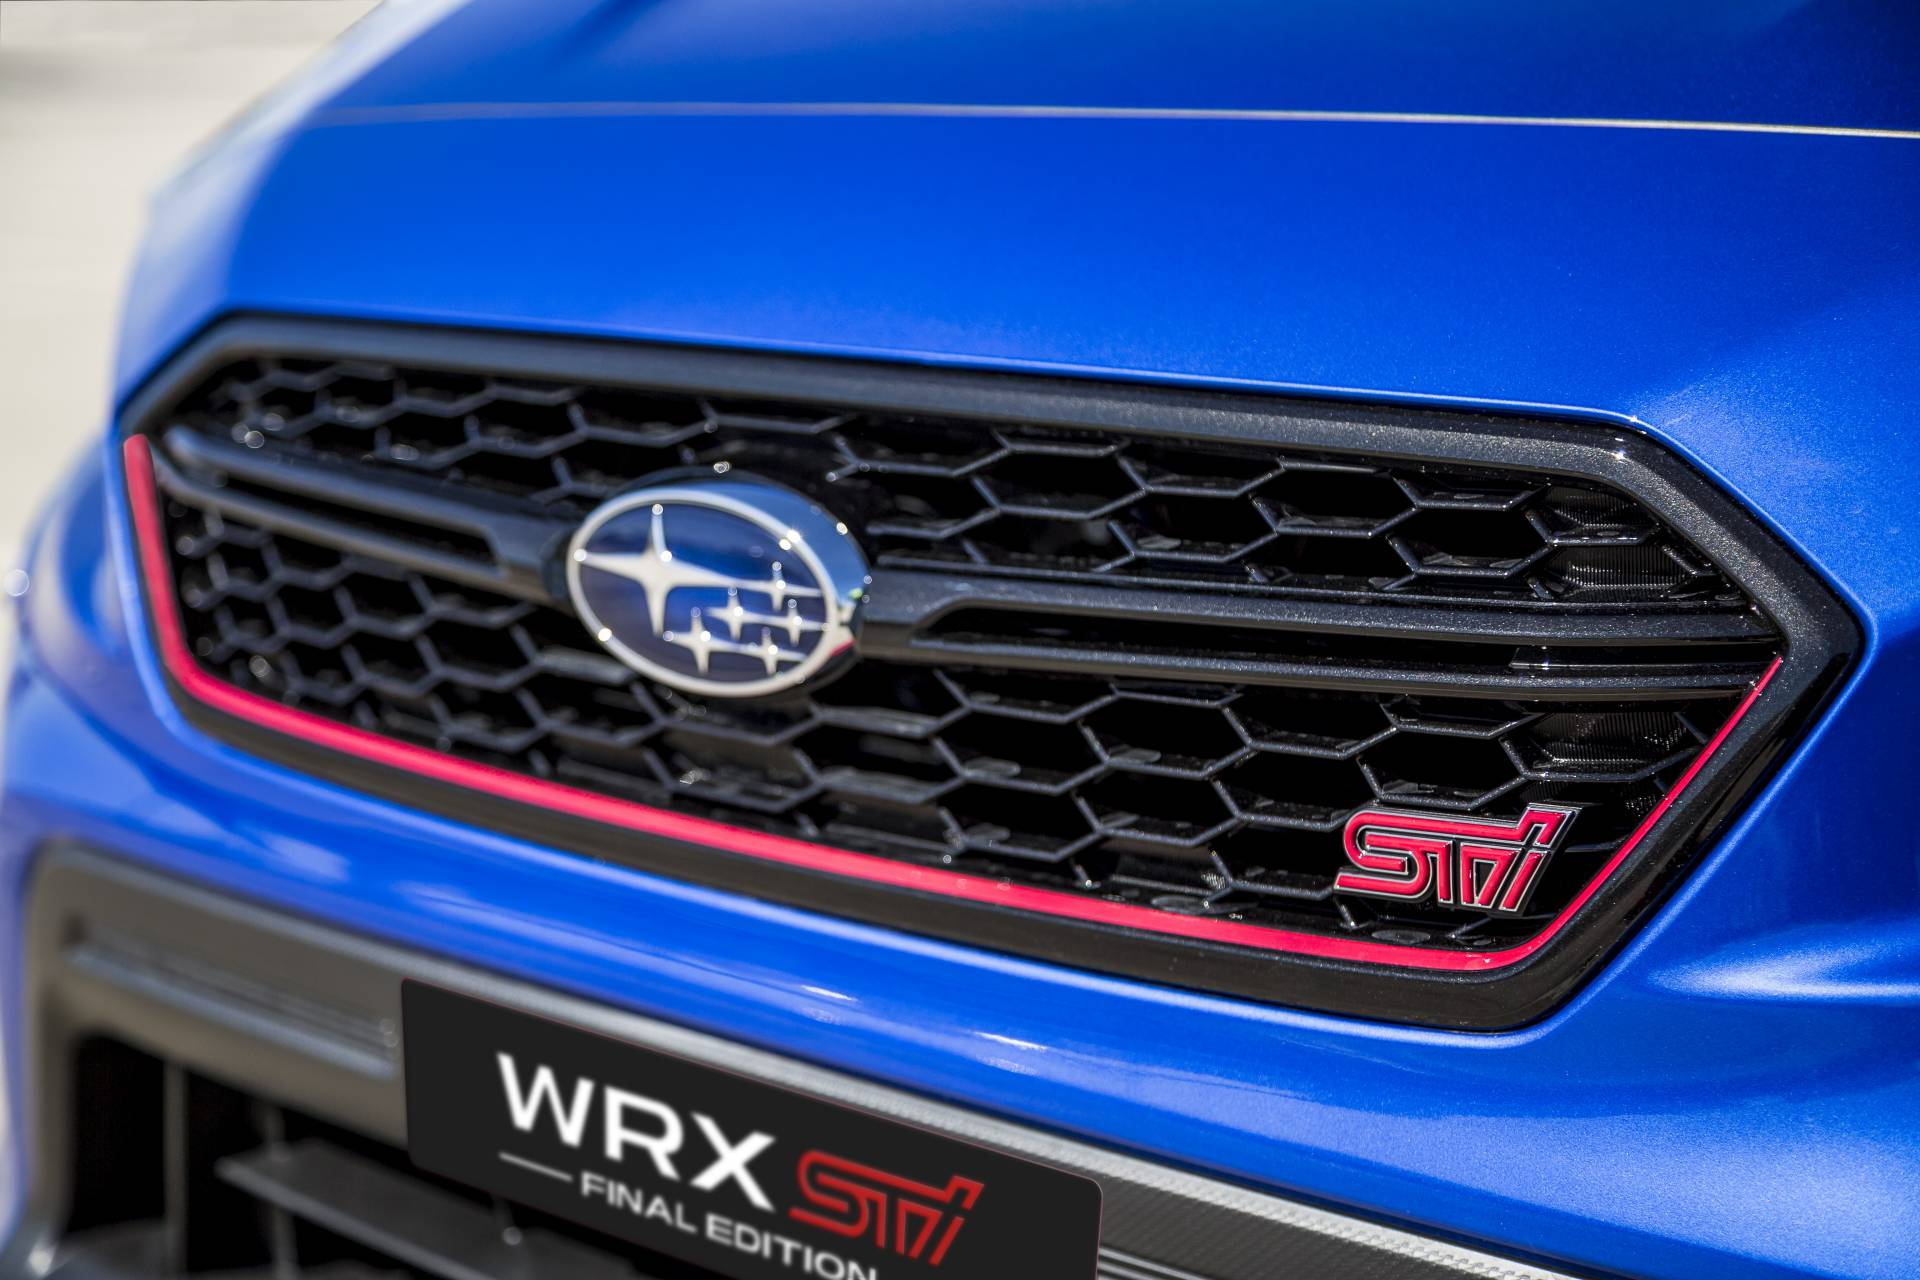 Subaru_WRX_STI_Final_Edition_0001